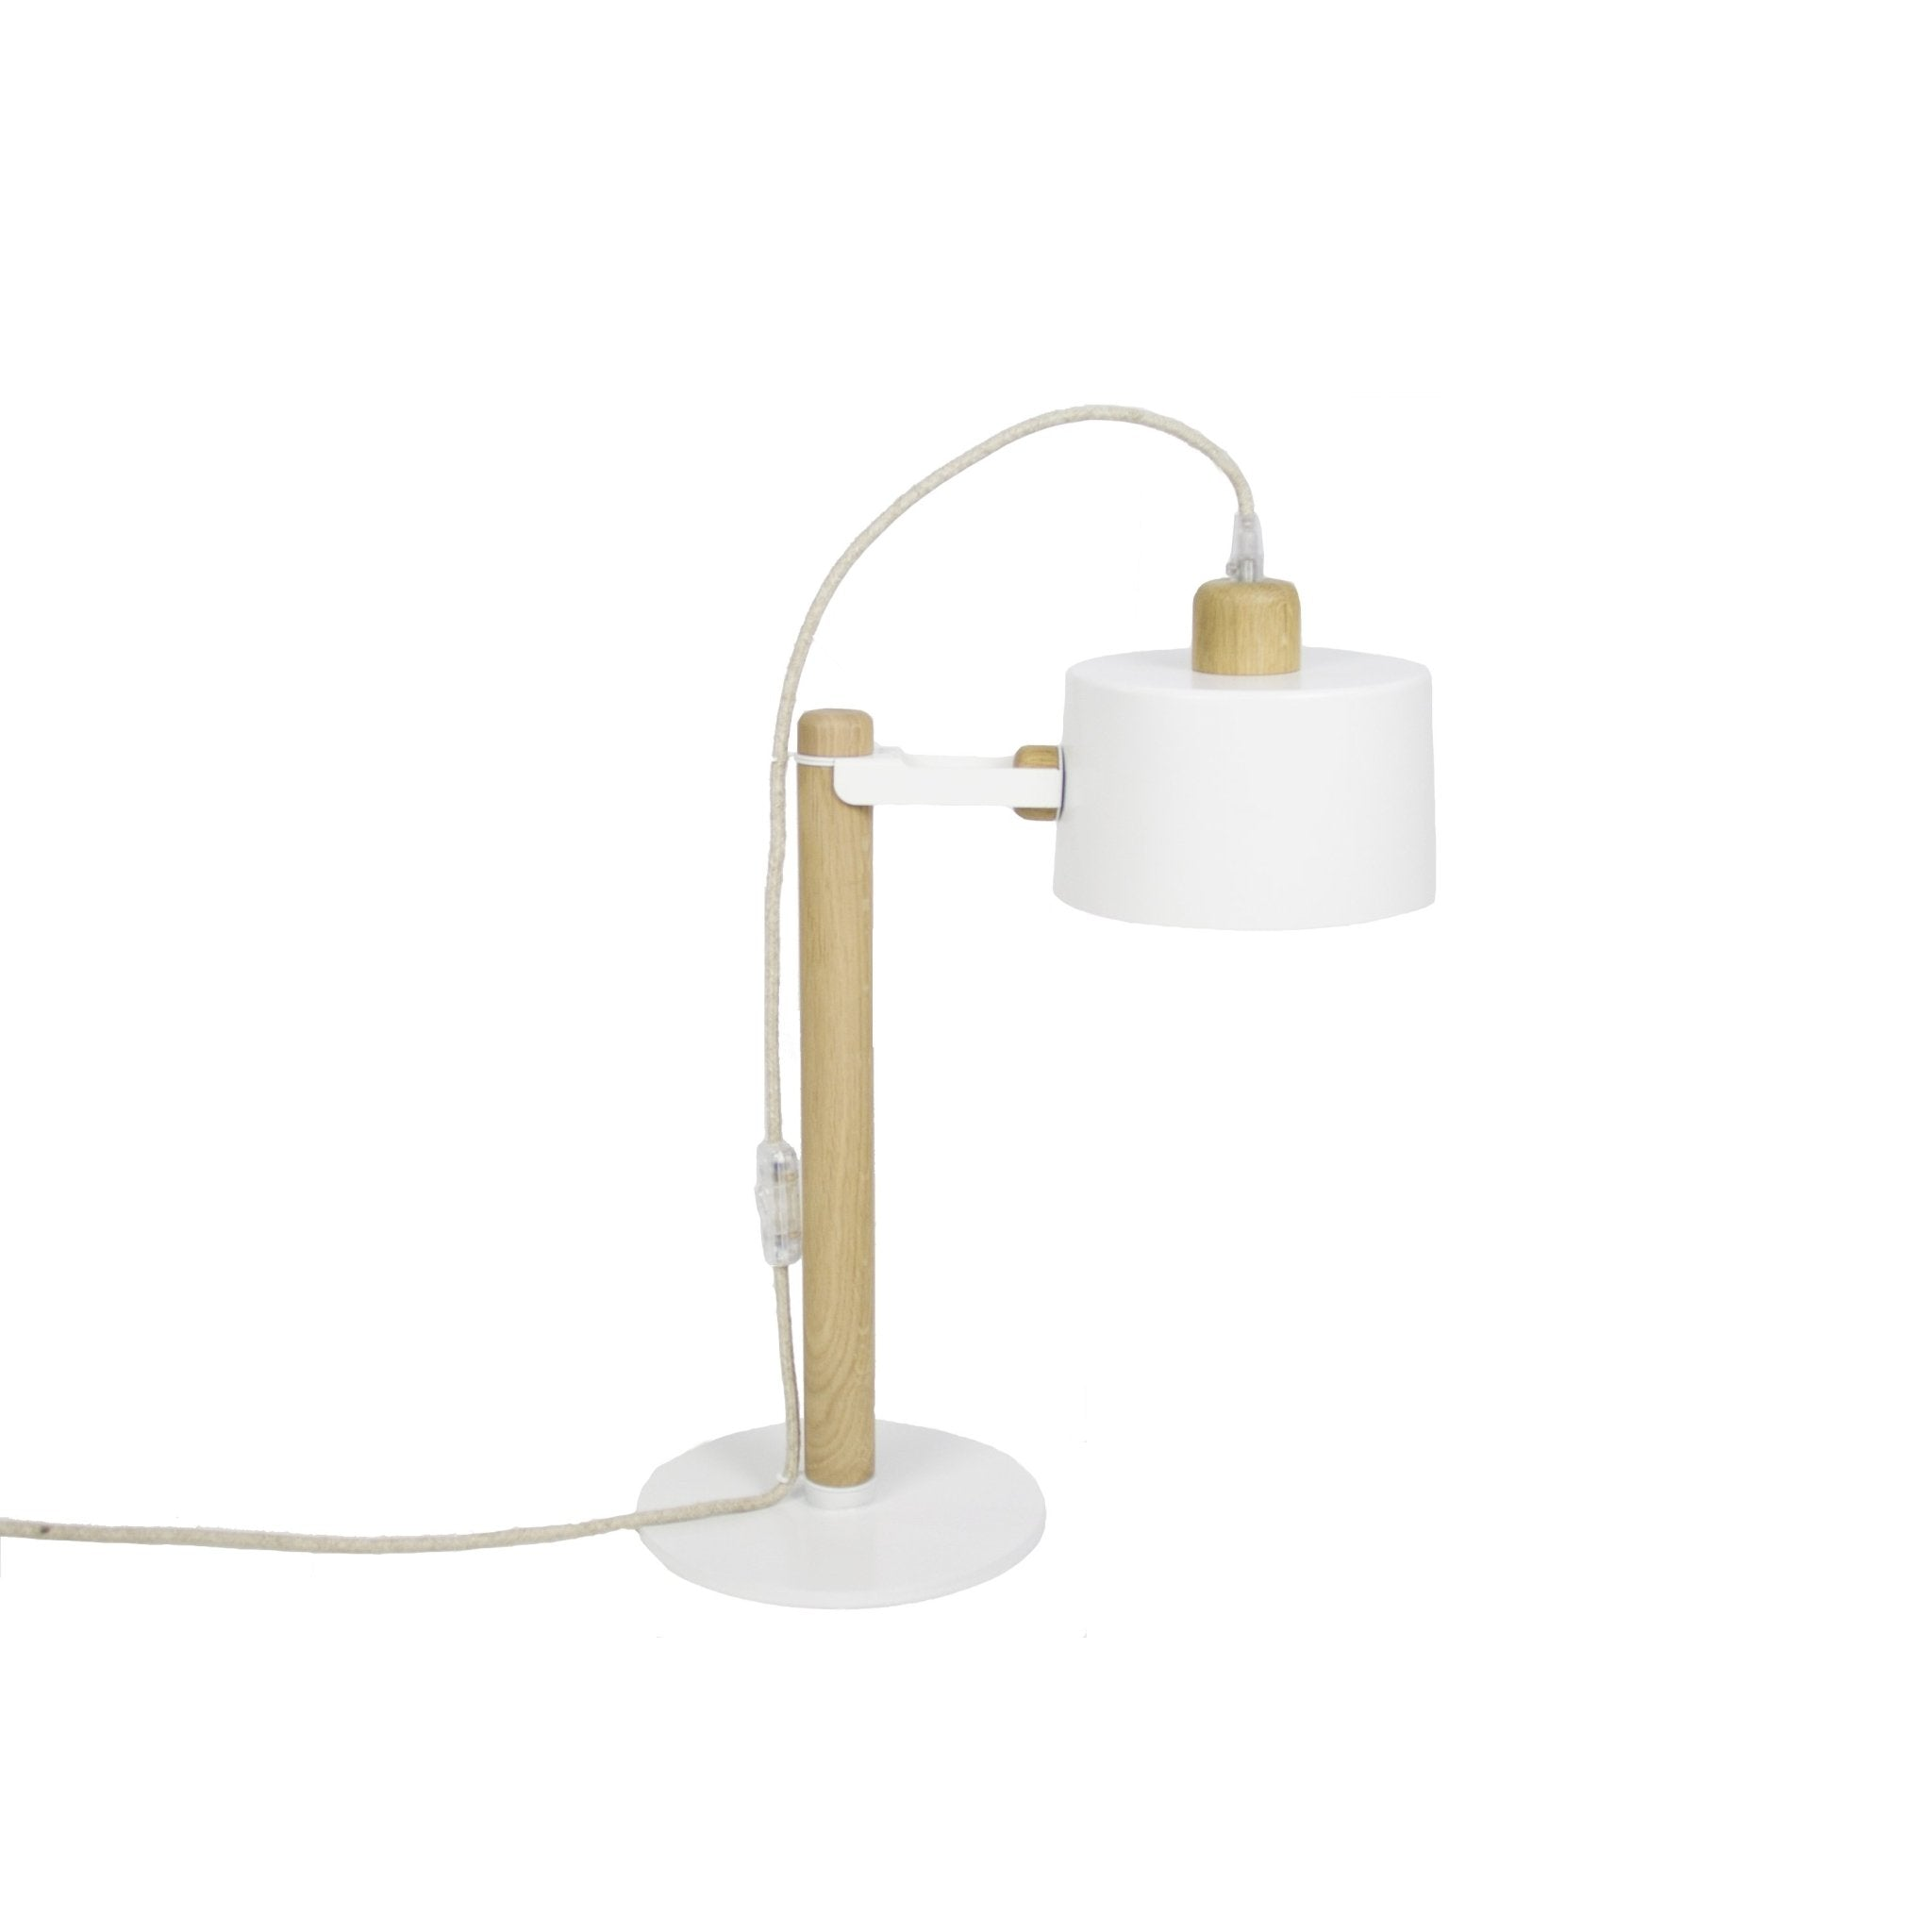 Lampe à poser en chêne et métal blanc